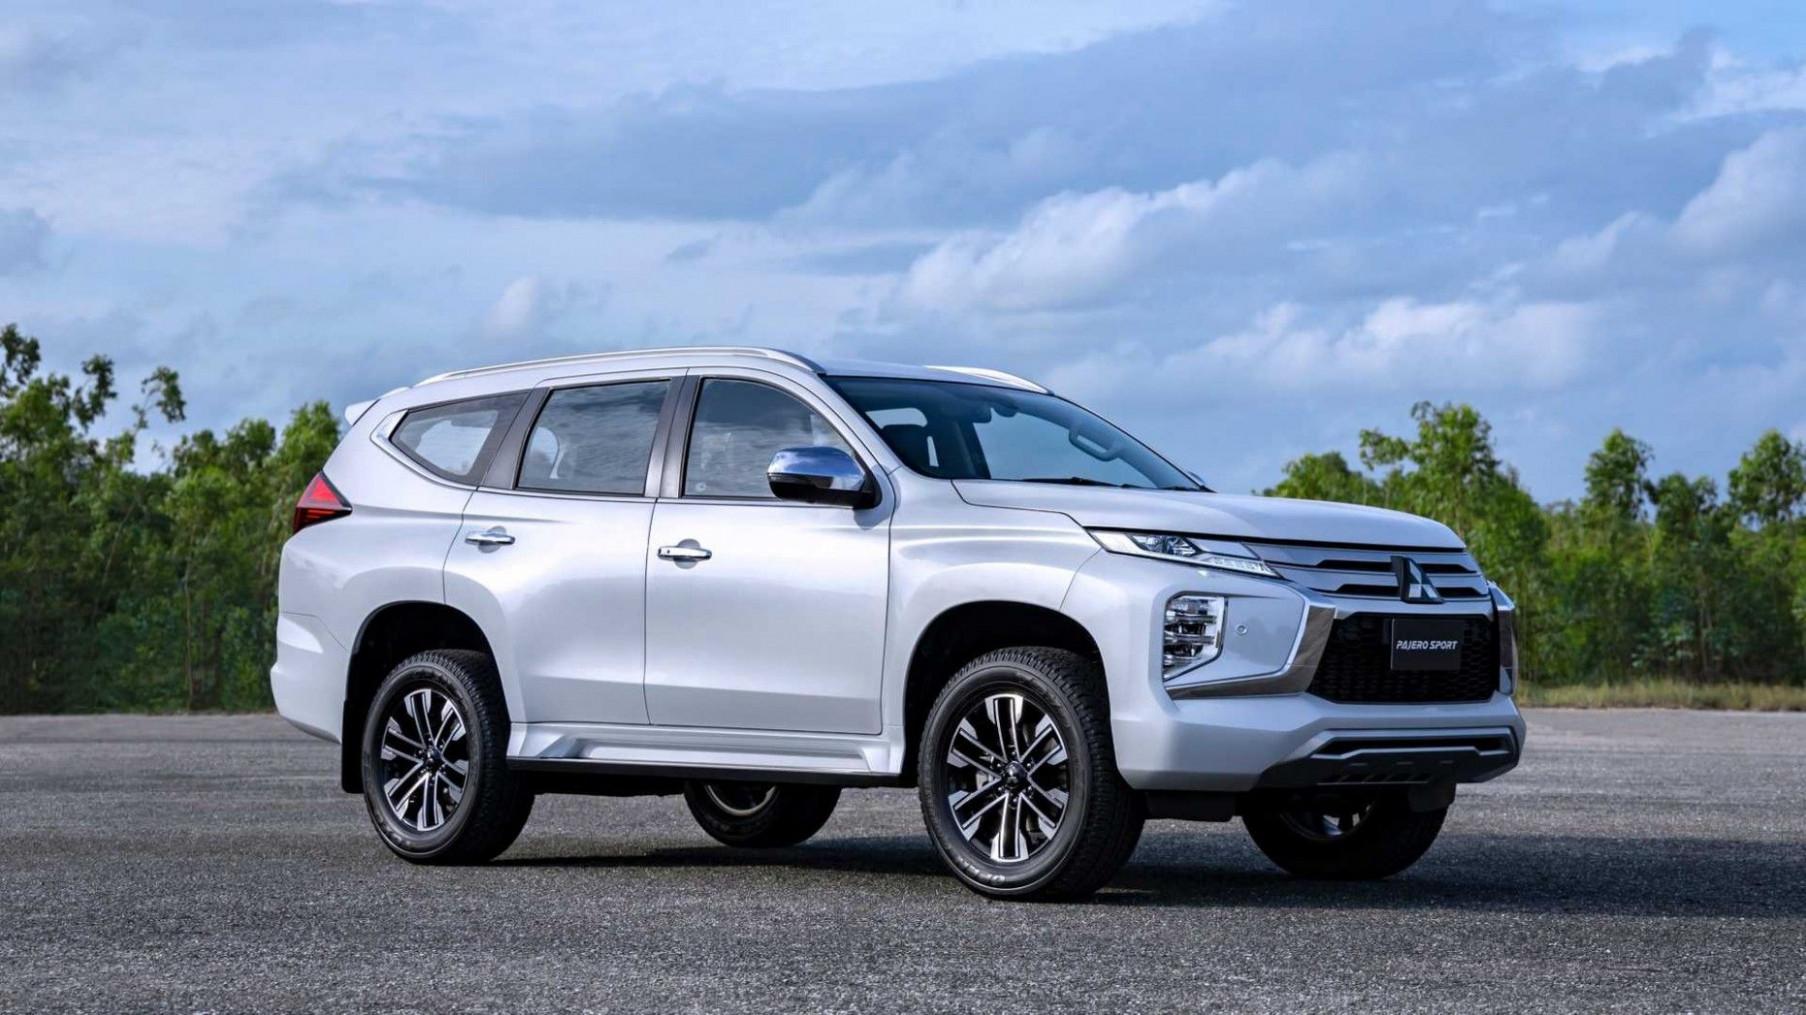 Rumors 2022 Mitsubishi Montero Sport Philippines